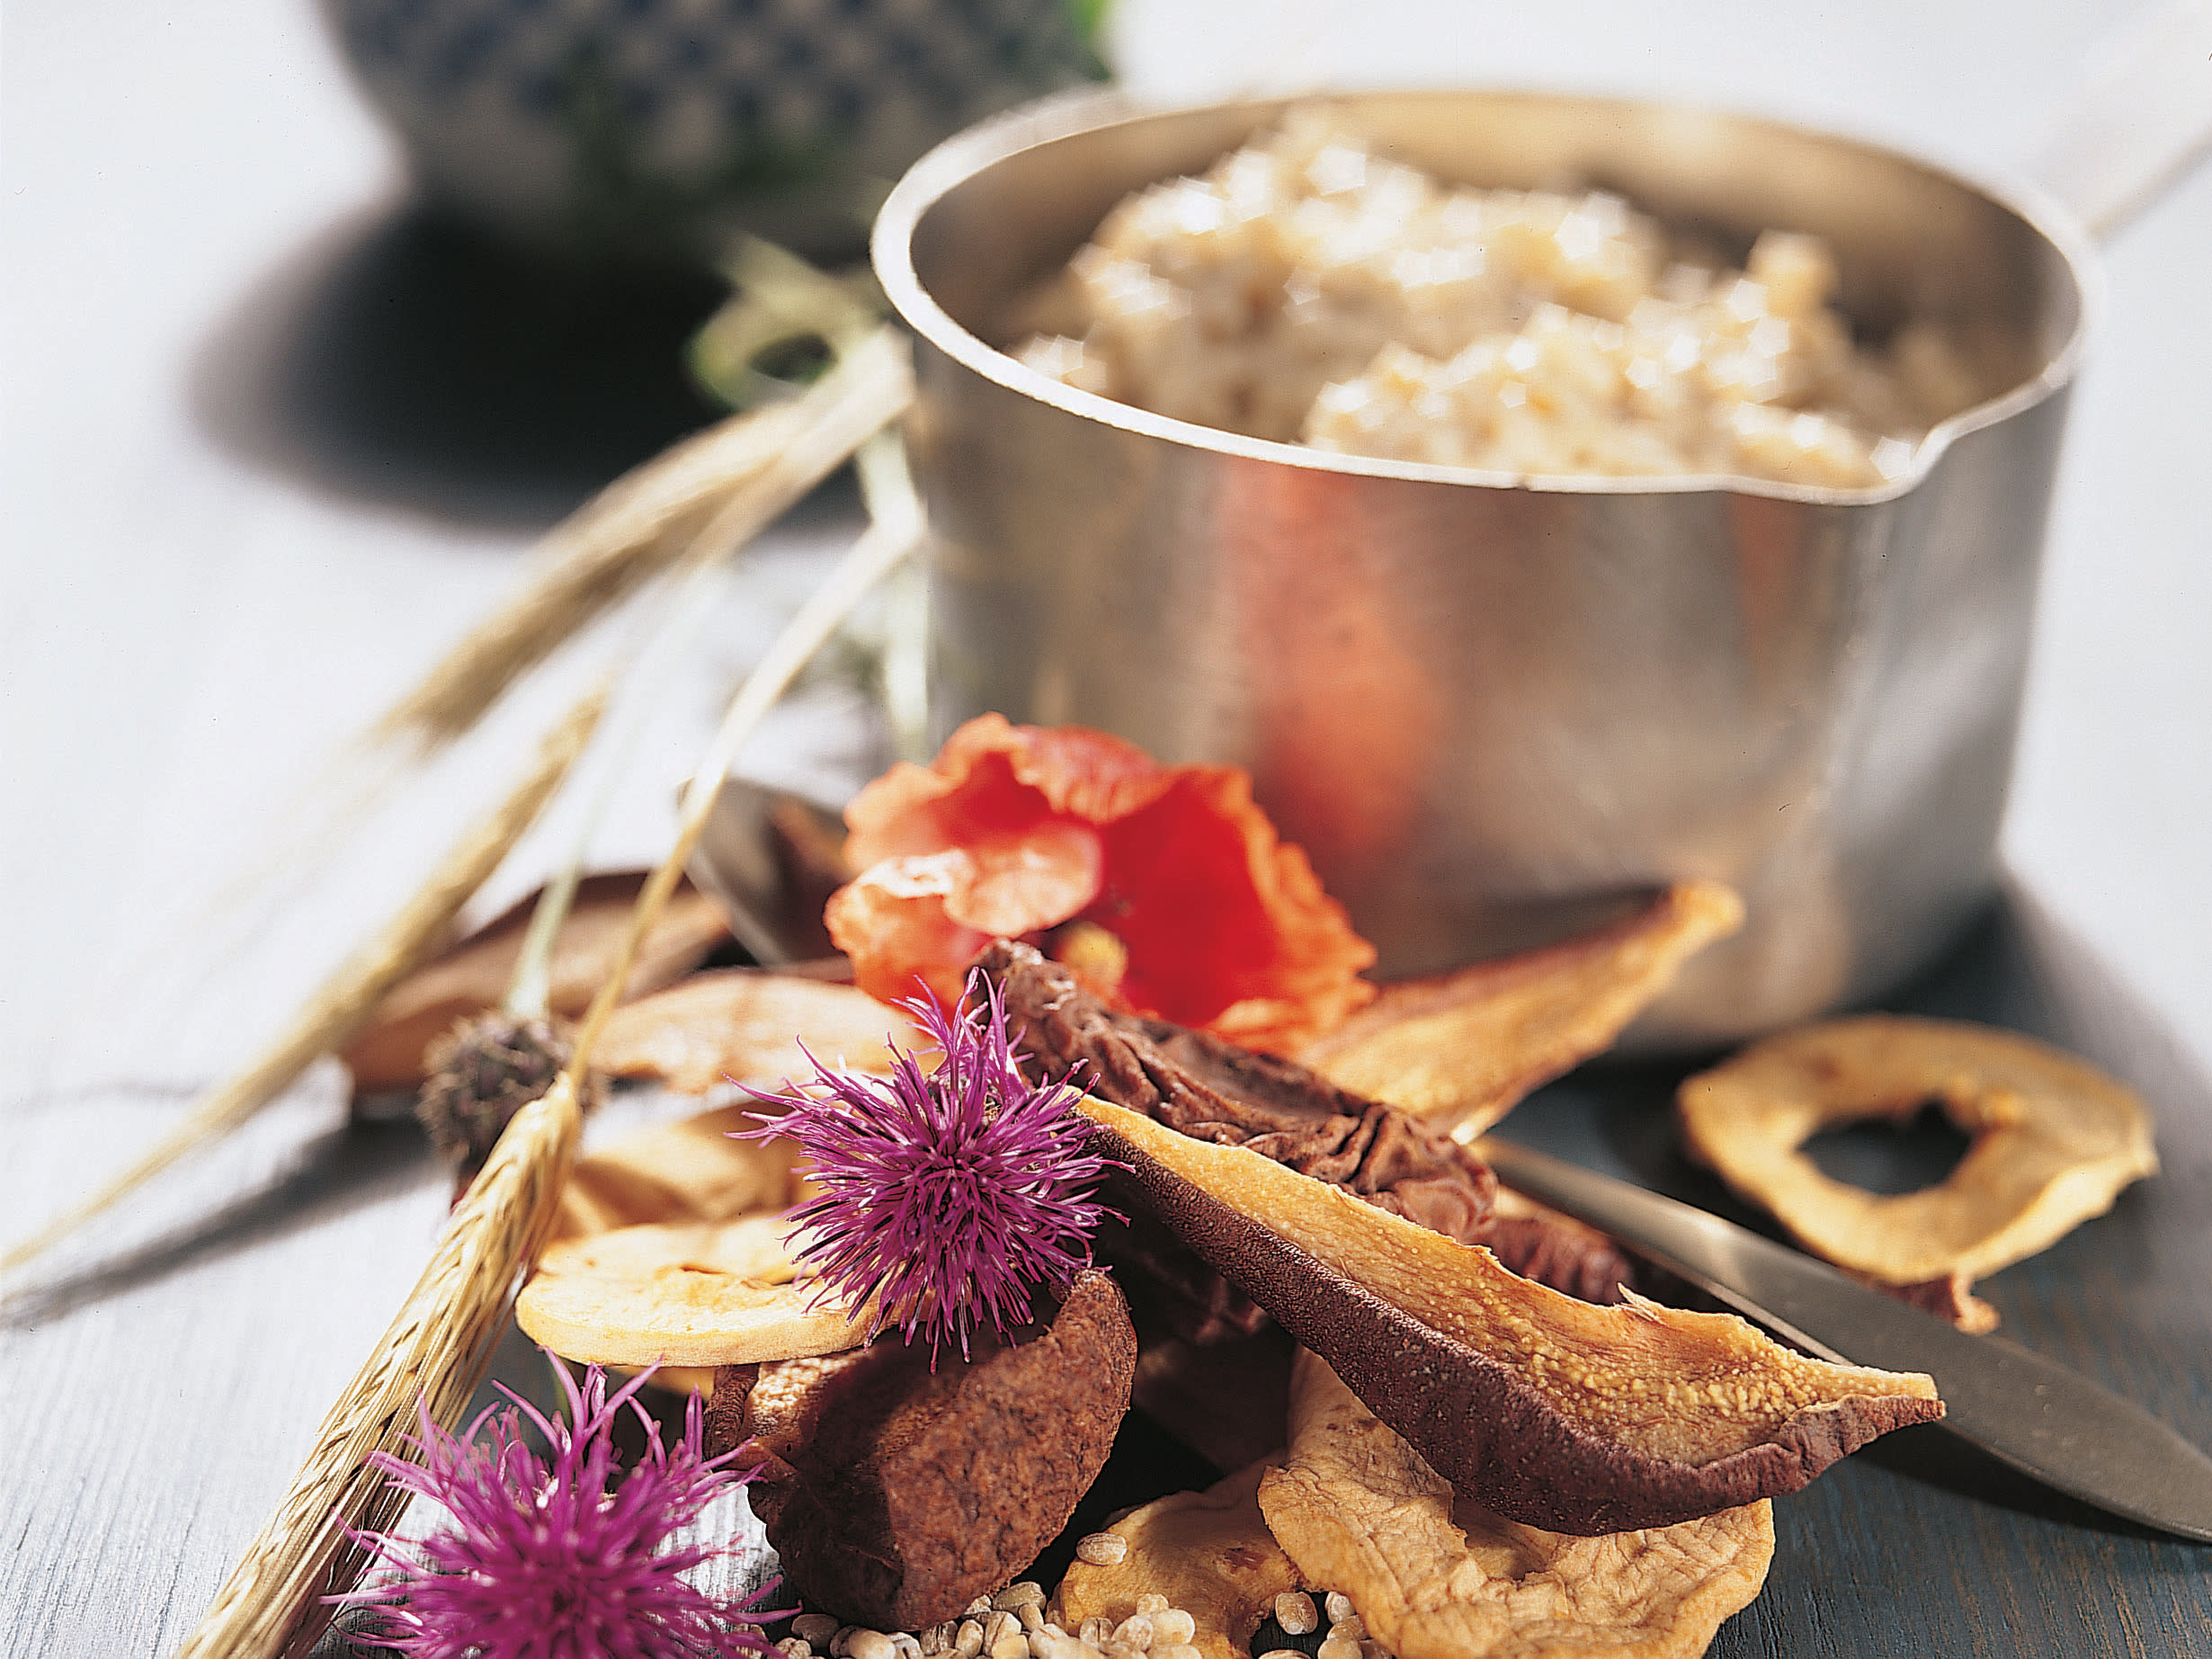 Kompot z ricetom in suhim sadjem(Orge à la compote de fruits secs)